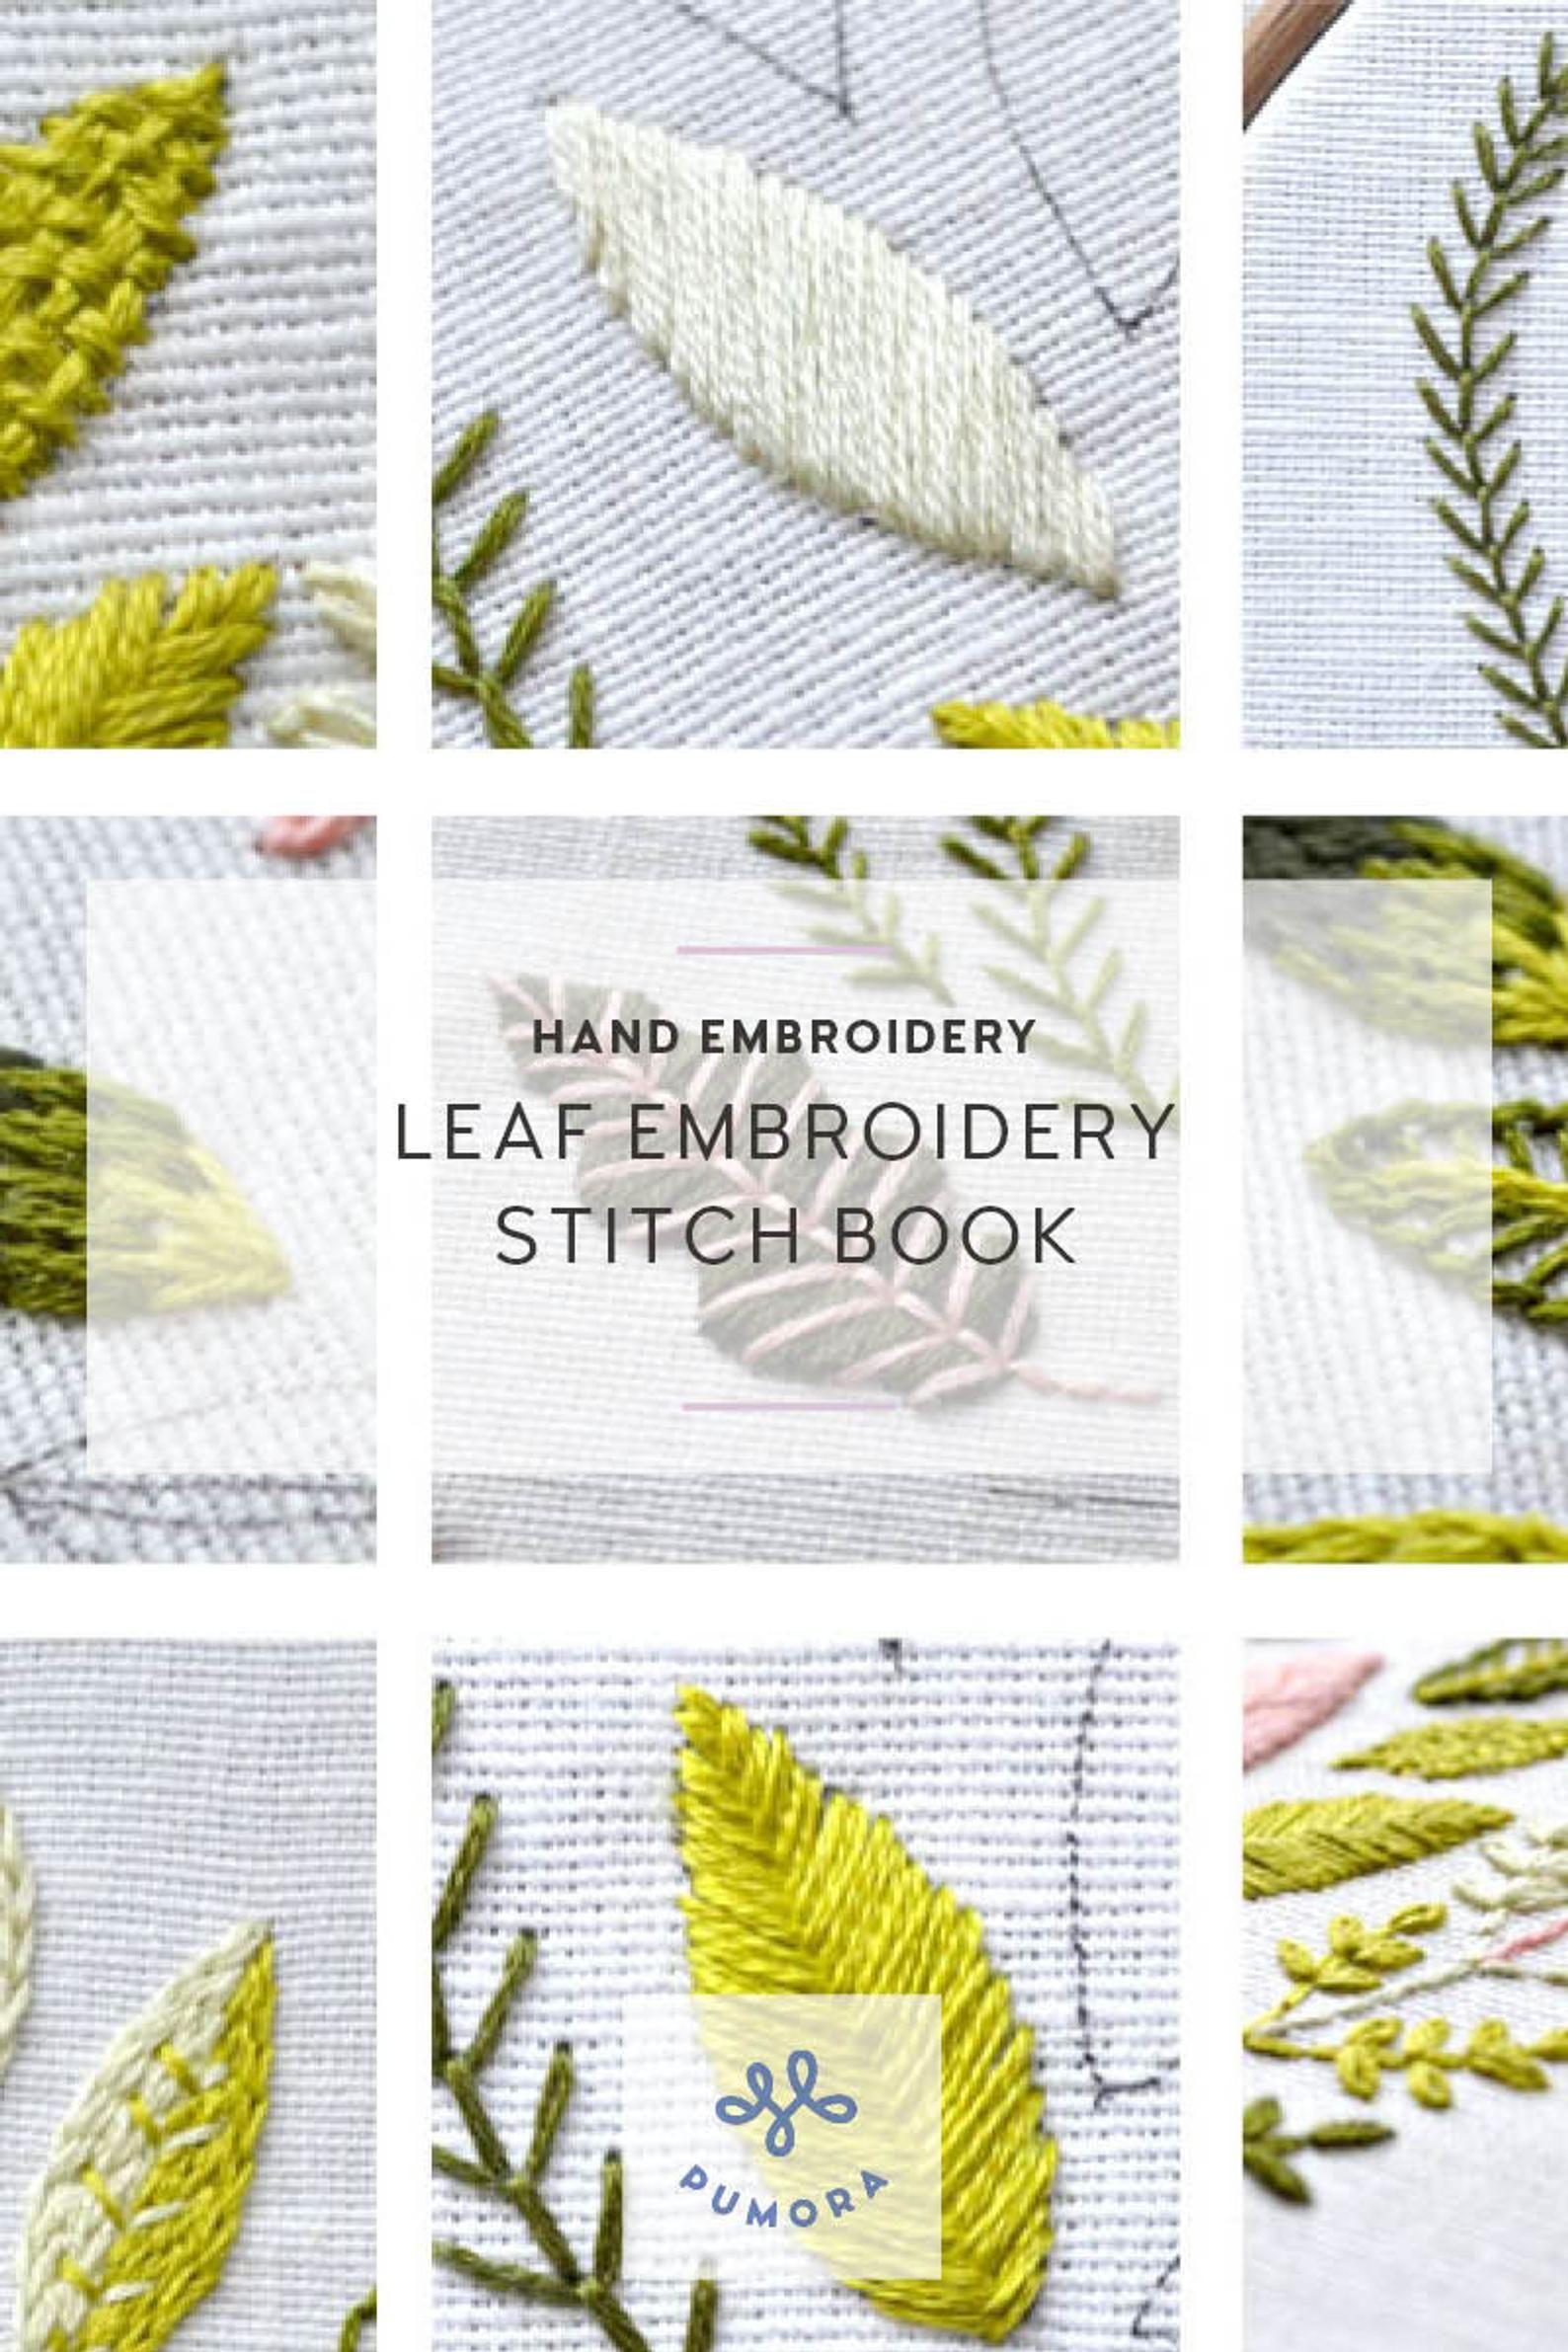 Leaf Stitch Tutorial : stitch, tutorial, Modern, Embroidery, Pattern, Botanical, Stitching, Stitch, Book,, Learn